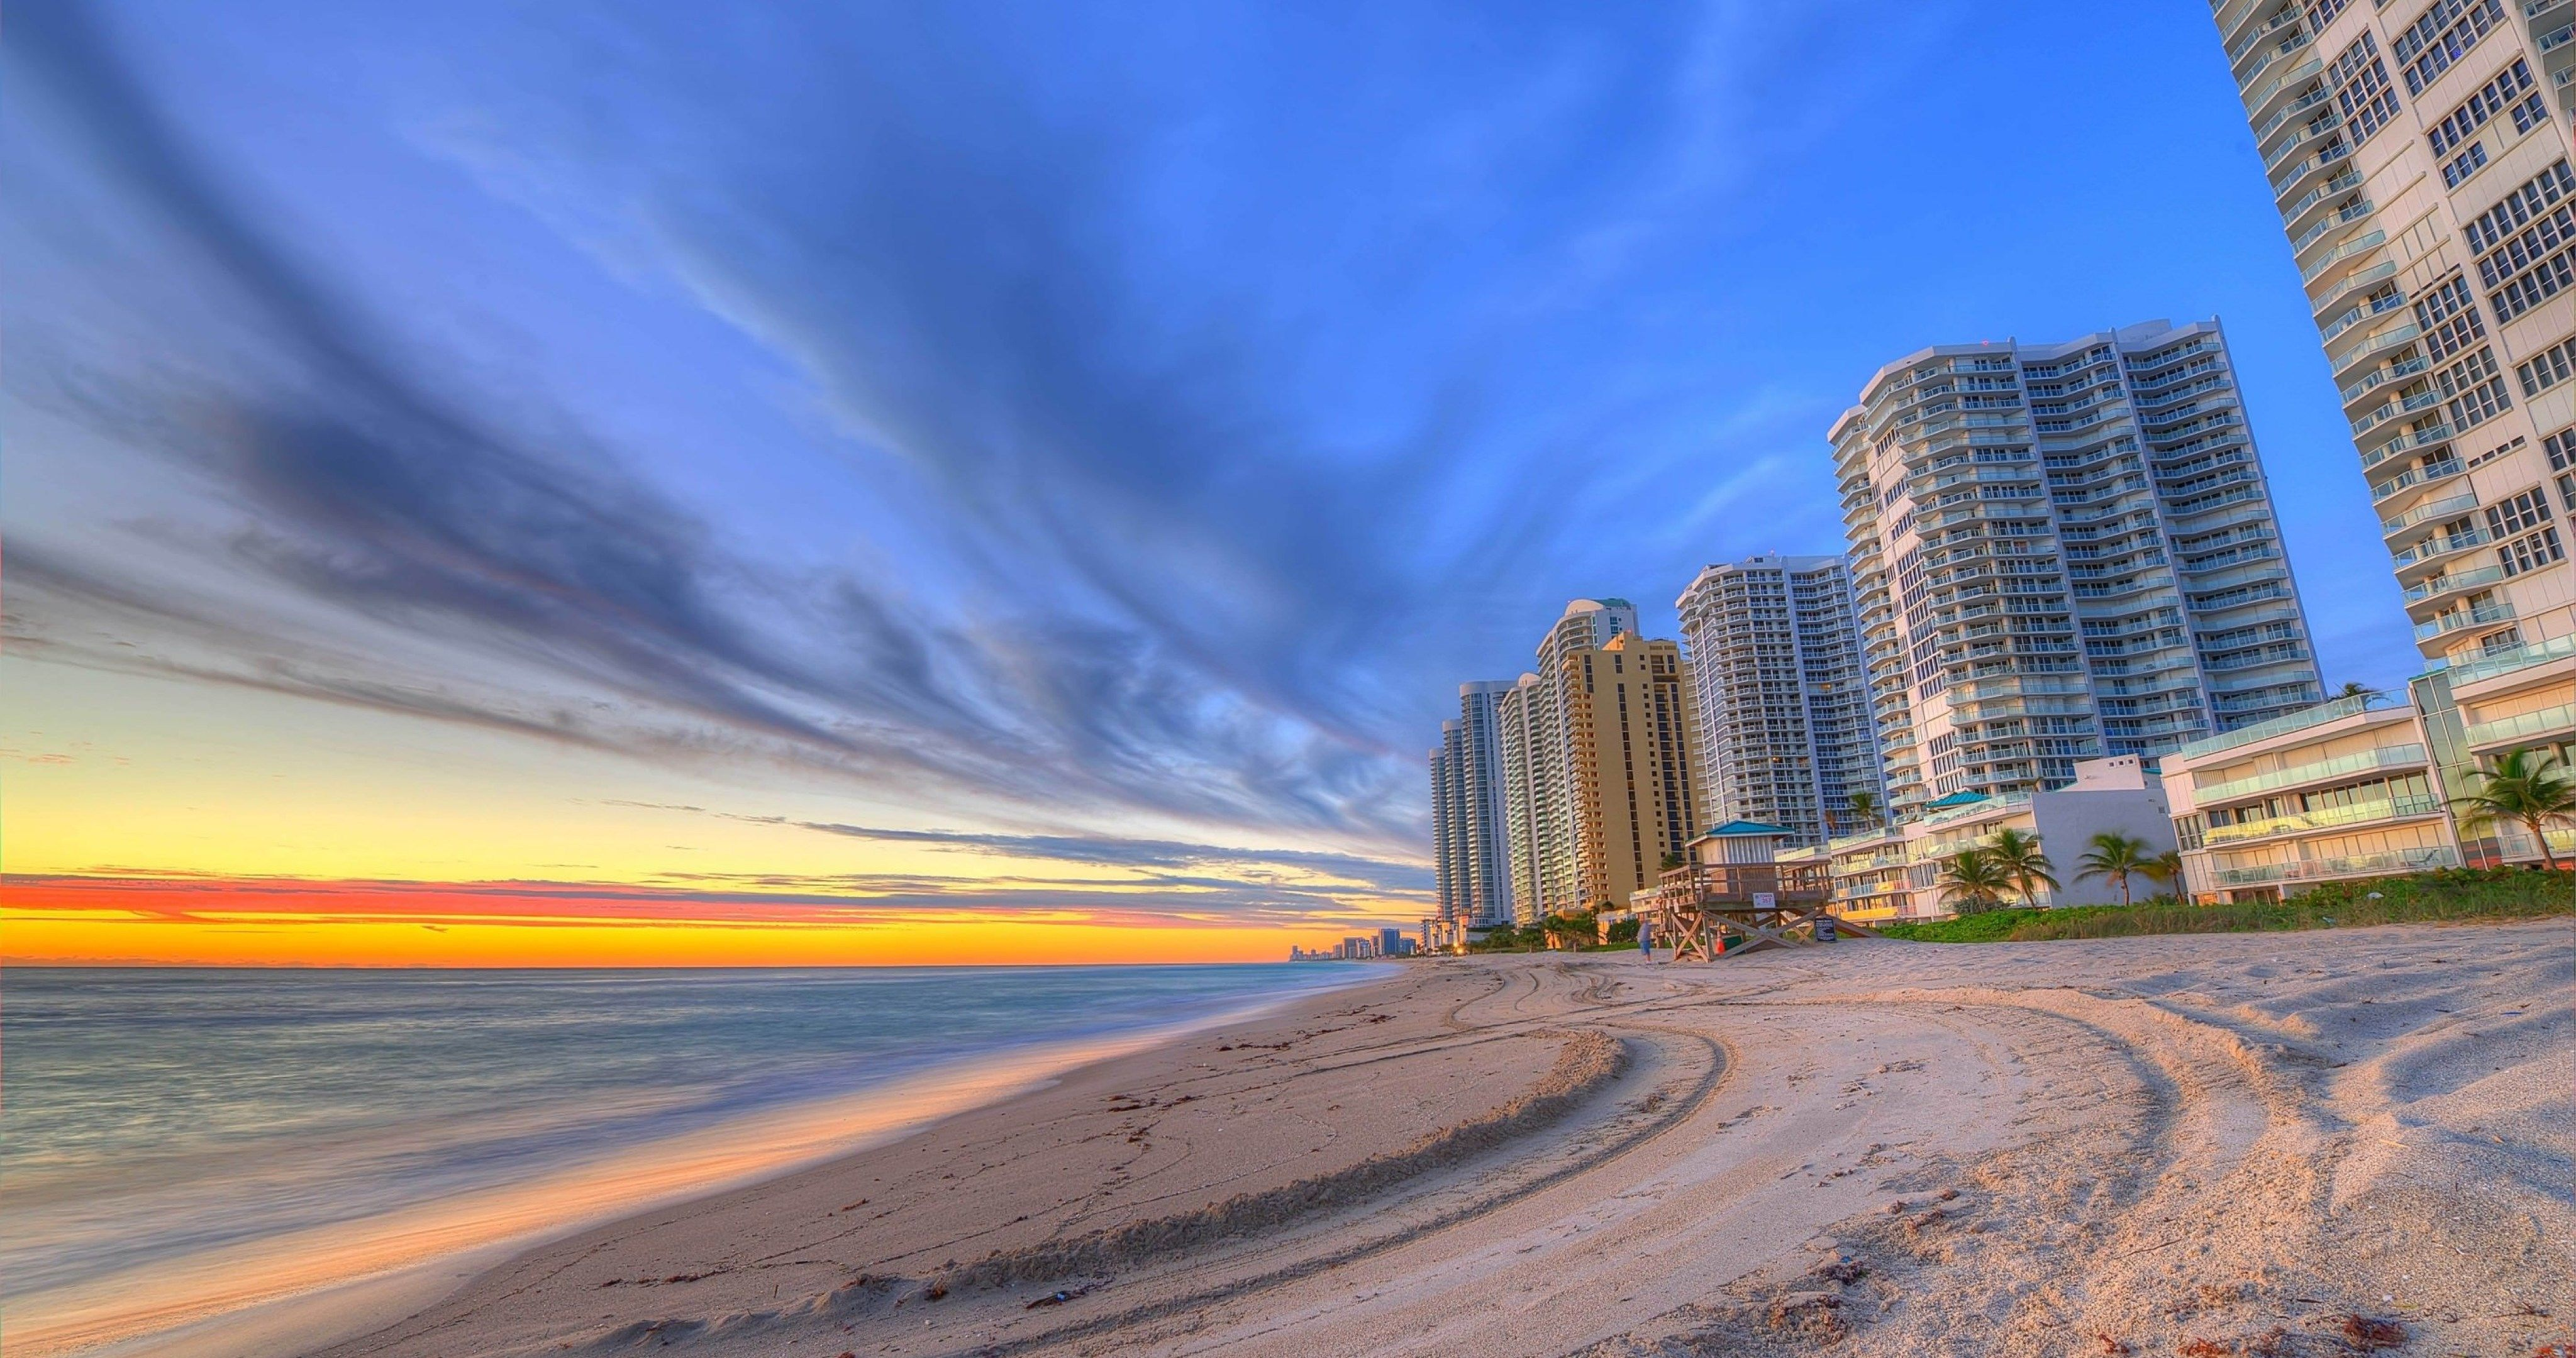 florida miami beach 4k ultra hd wallpaper Miami beach